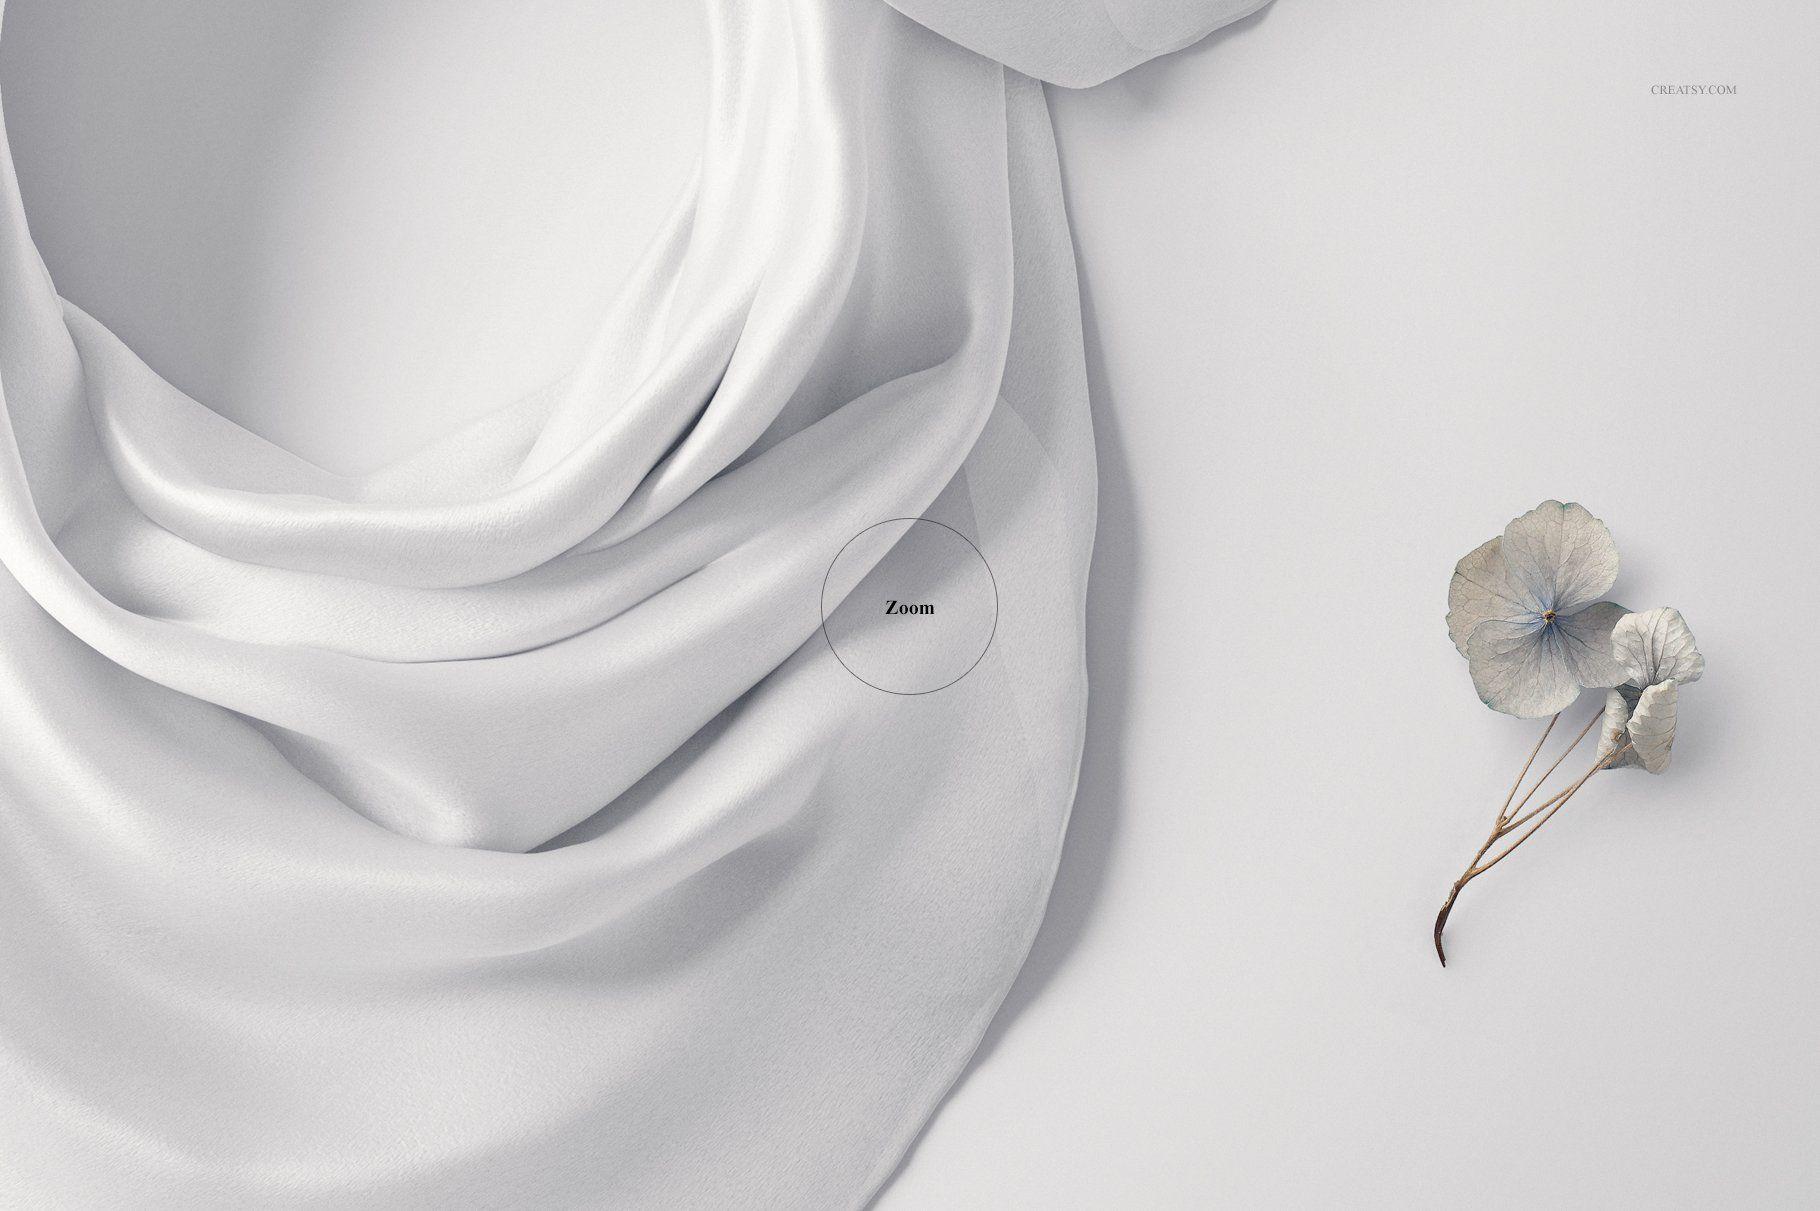 Download Wrapped Silk Scarf Mockup 22 Ffv 9 Fabric Factory Scarf Design Mockup